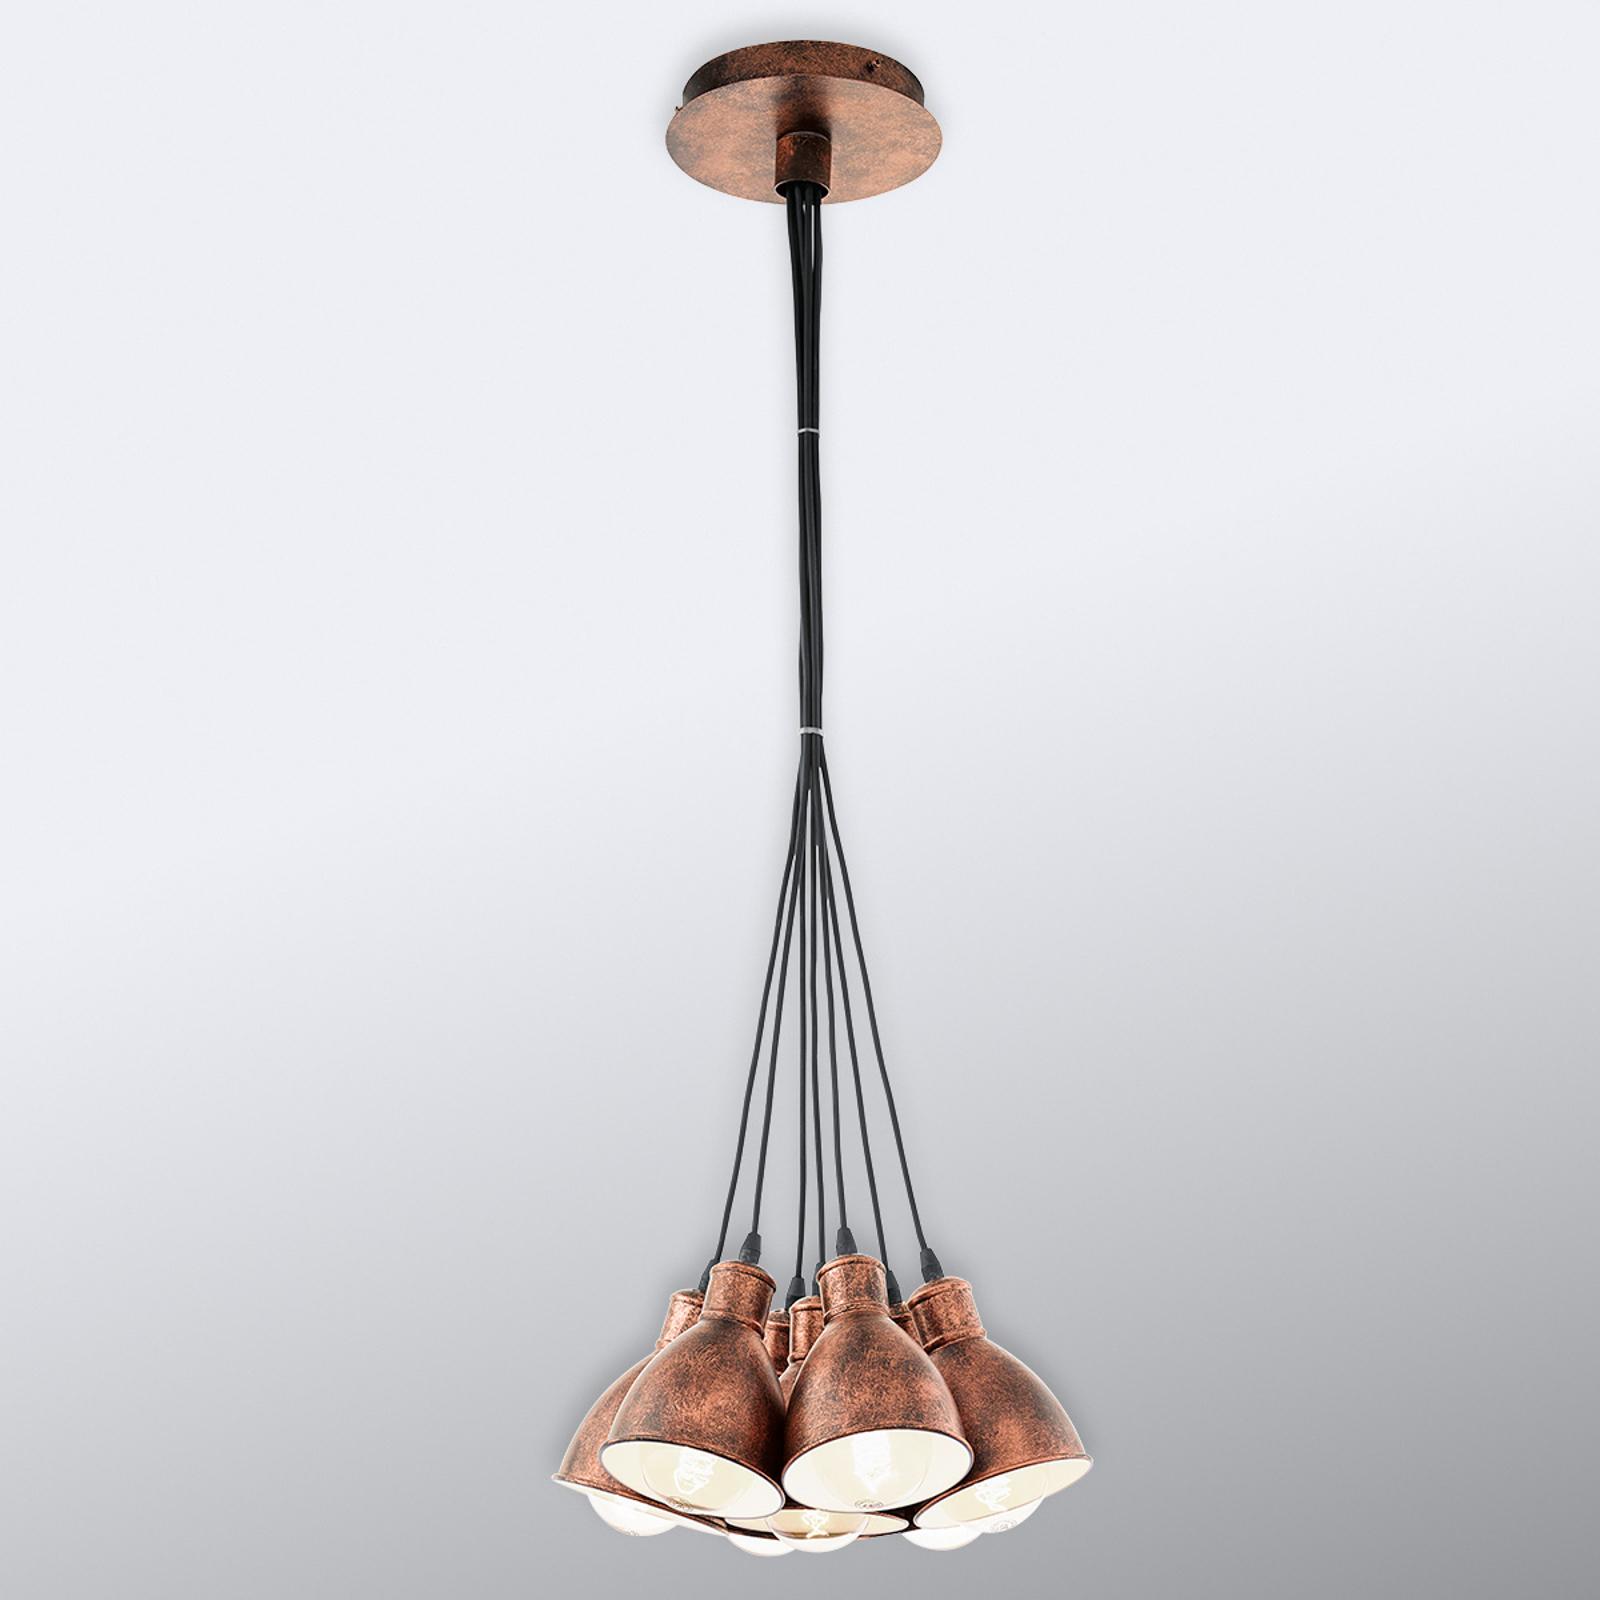 Priddy 1 vintagependellampa 7 lampor, koppar antik